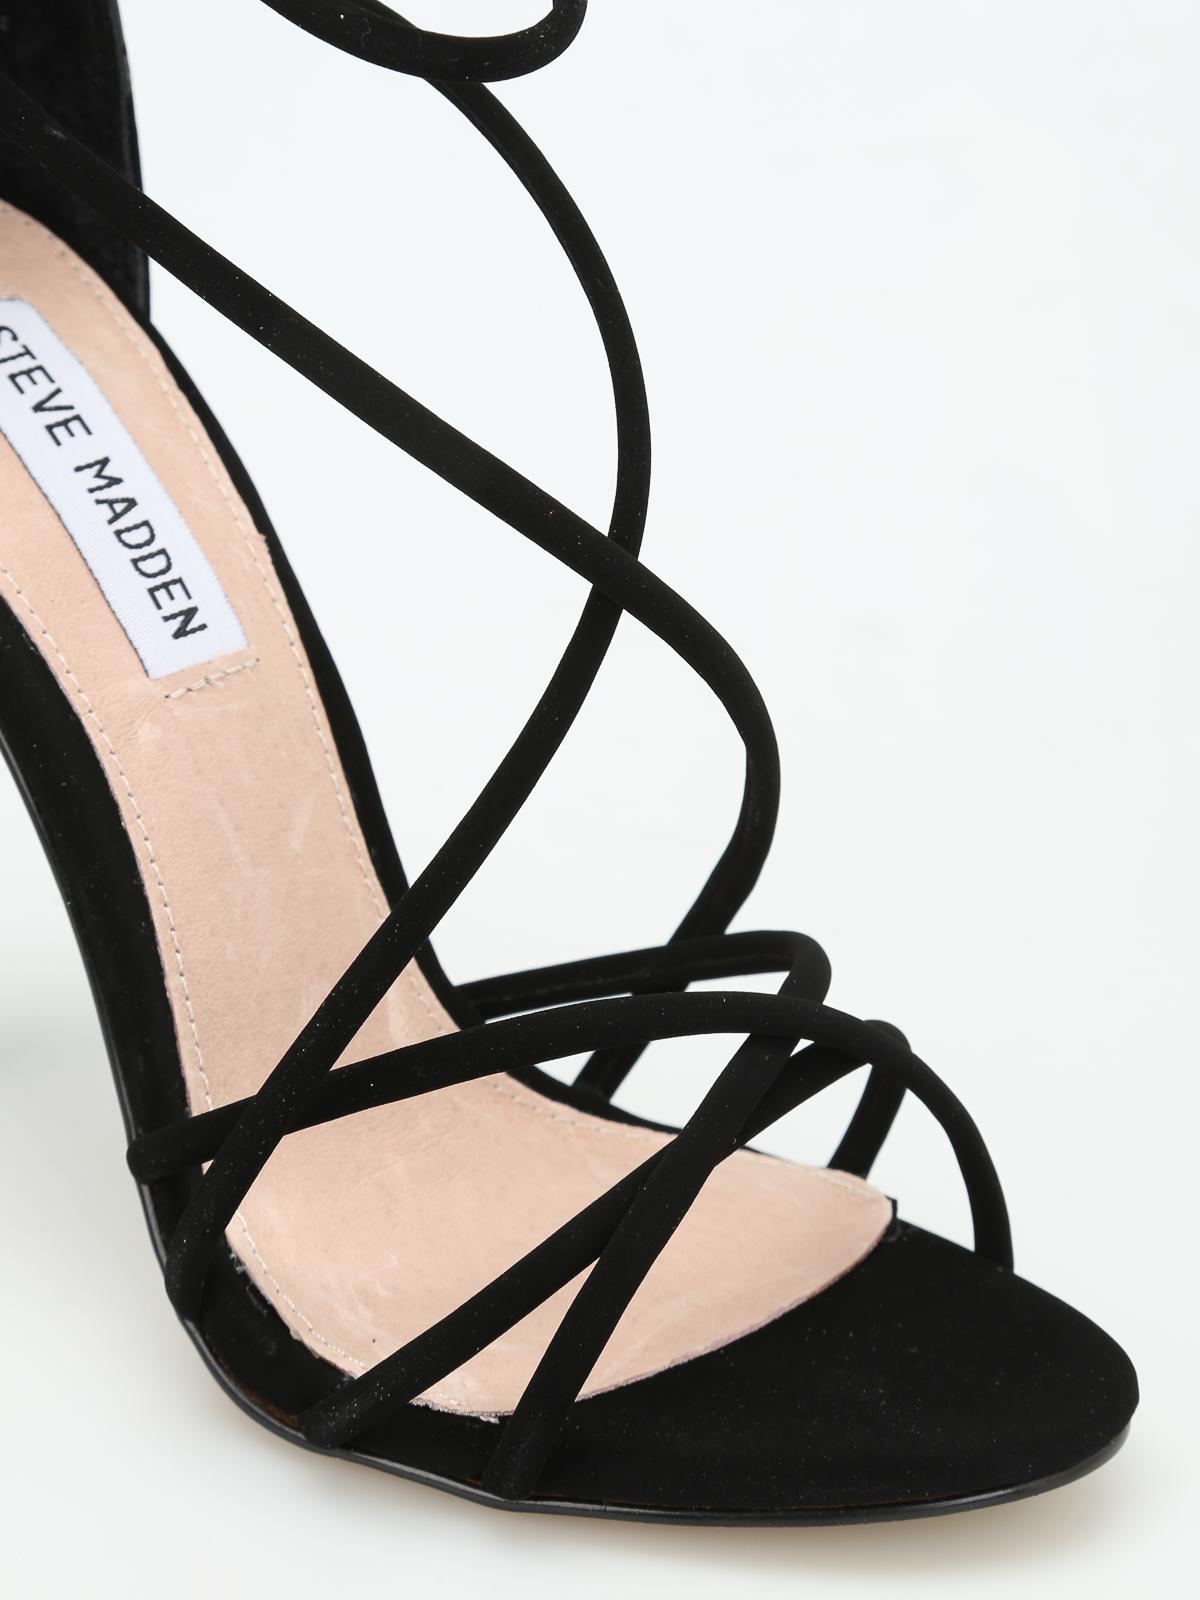 c6dbca9ae66 Steve Madden - Satire sandals - sandals - SATIRE BLACK